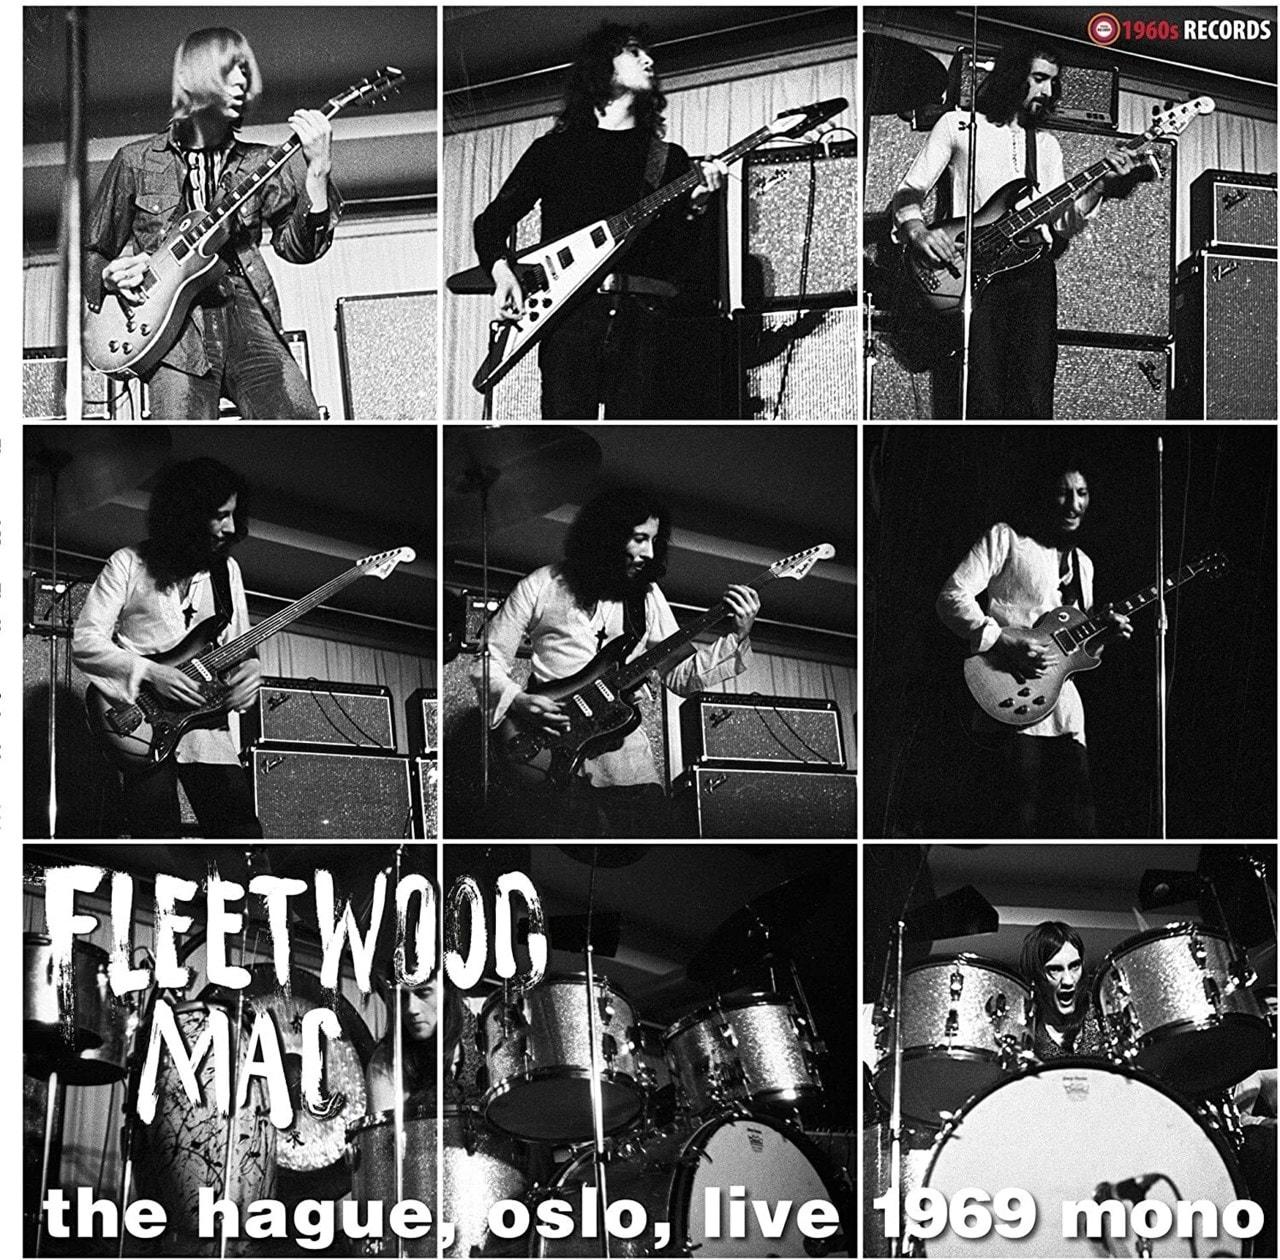 Live 1969 (Oslo & the Hague) - 1